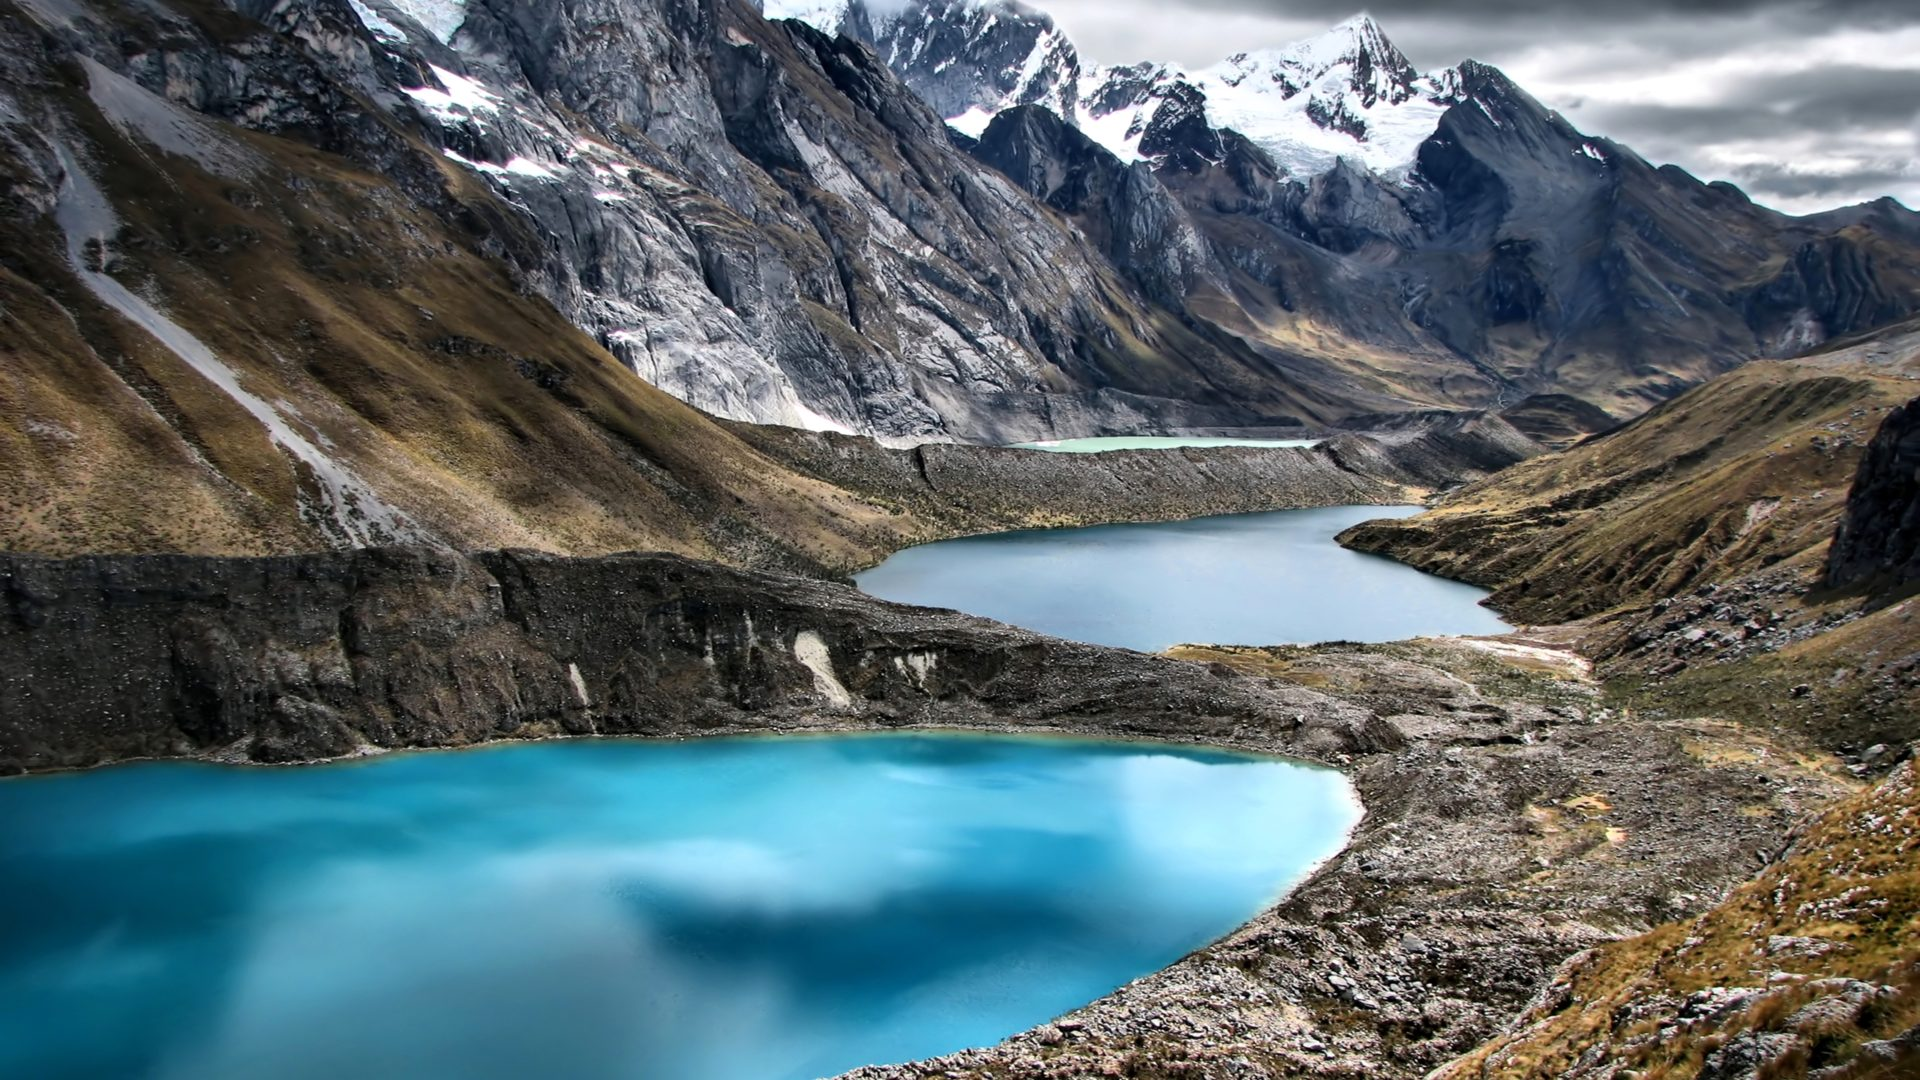 Free Fall Desktop Wallpaper Backgrounds Peru Mountains Lake Cordillera Huayhuash Nature 409980